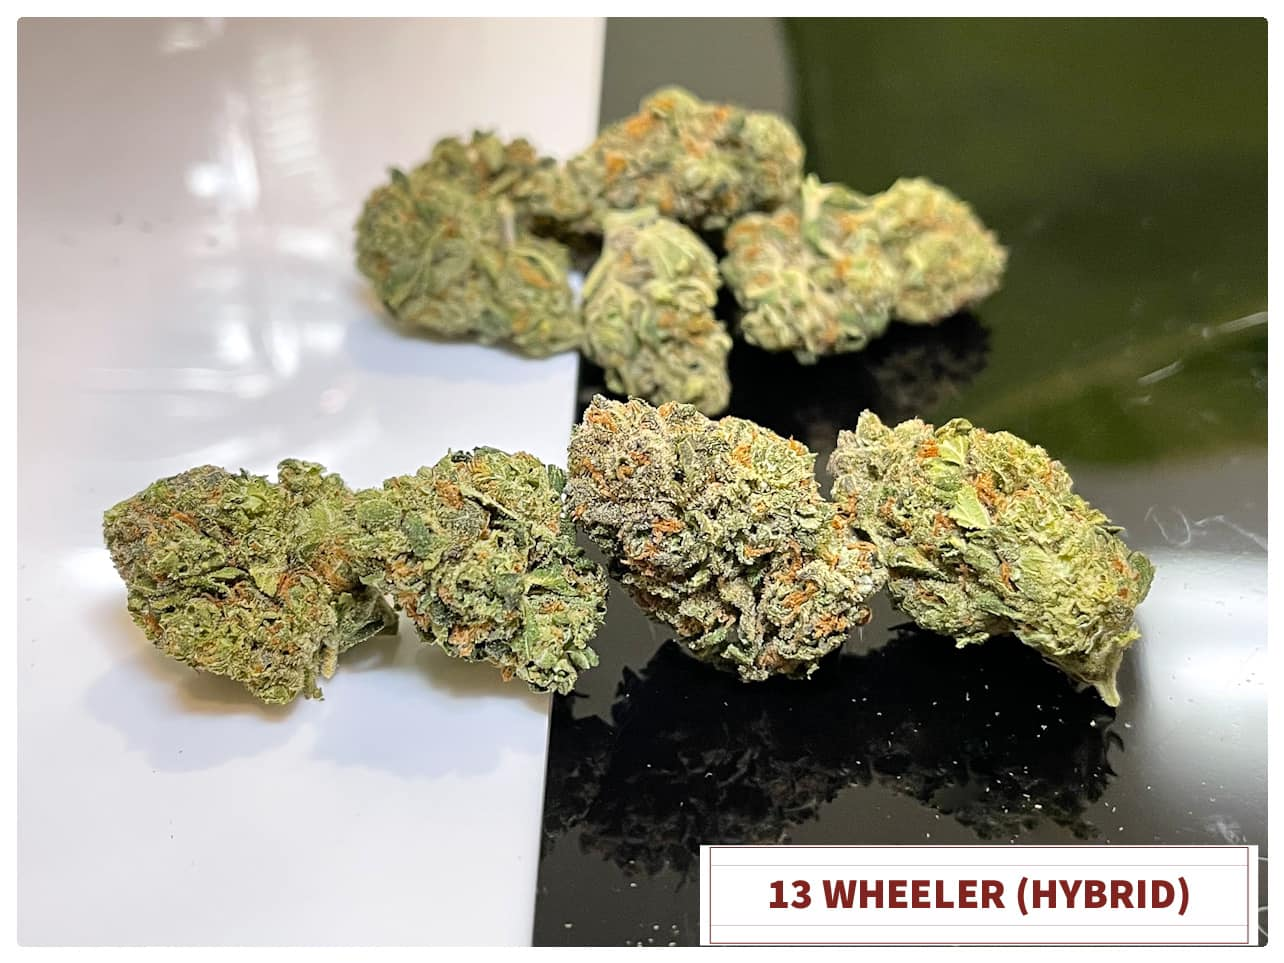 13 wheeler hybrid dispensary saints MMJ